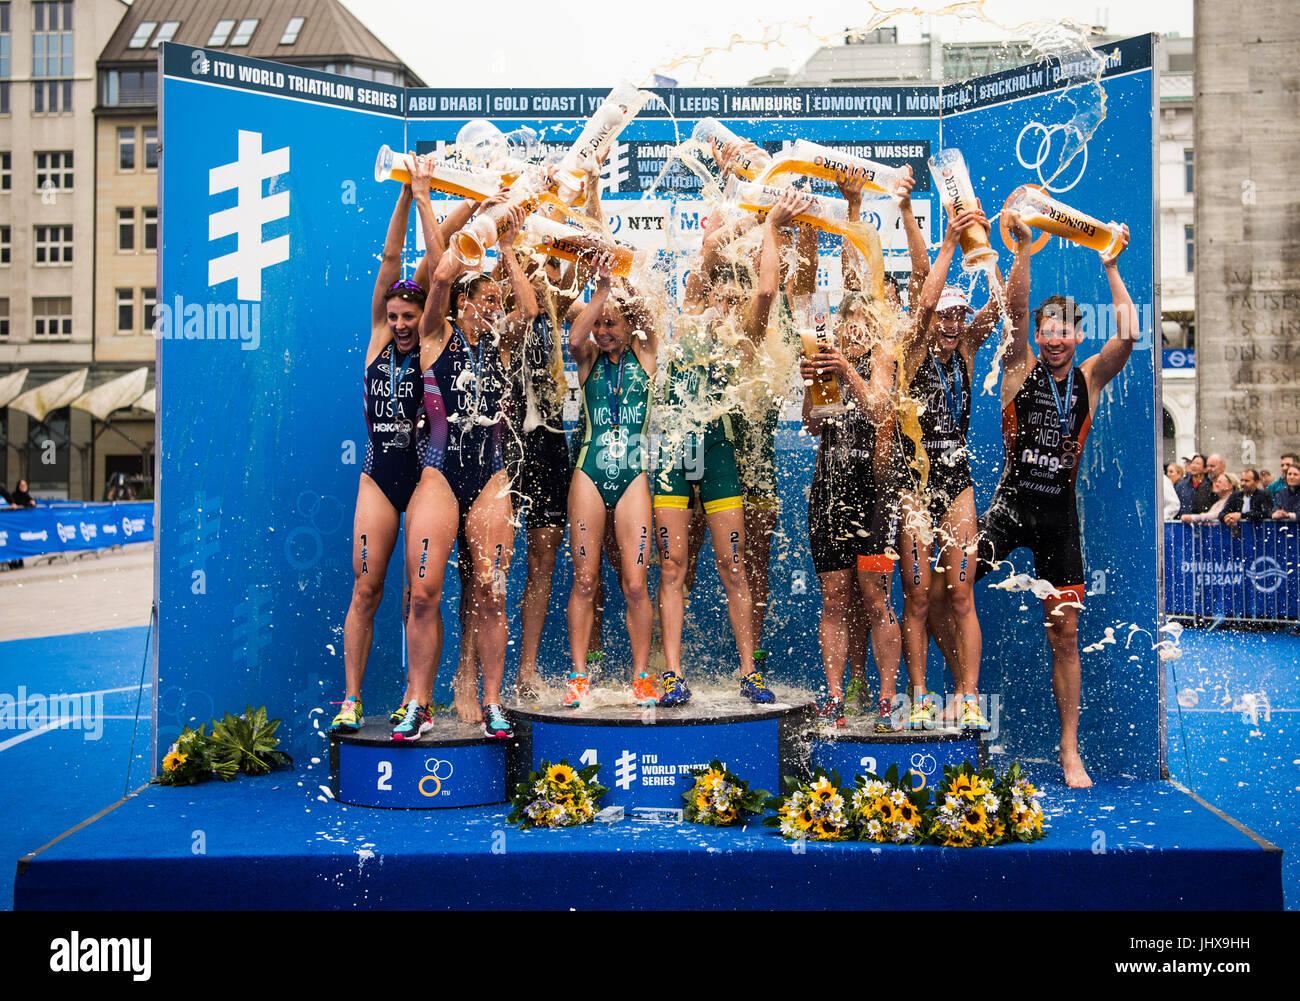 Hamburg, Germany. 16th July, 2017. dpatop - Charlotte McShane, Ashleigh Gentle, Matthew Hauser, Jacob Birtwhistle - Stock Image